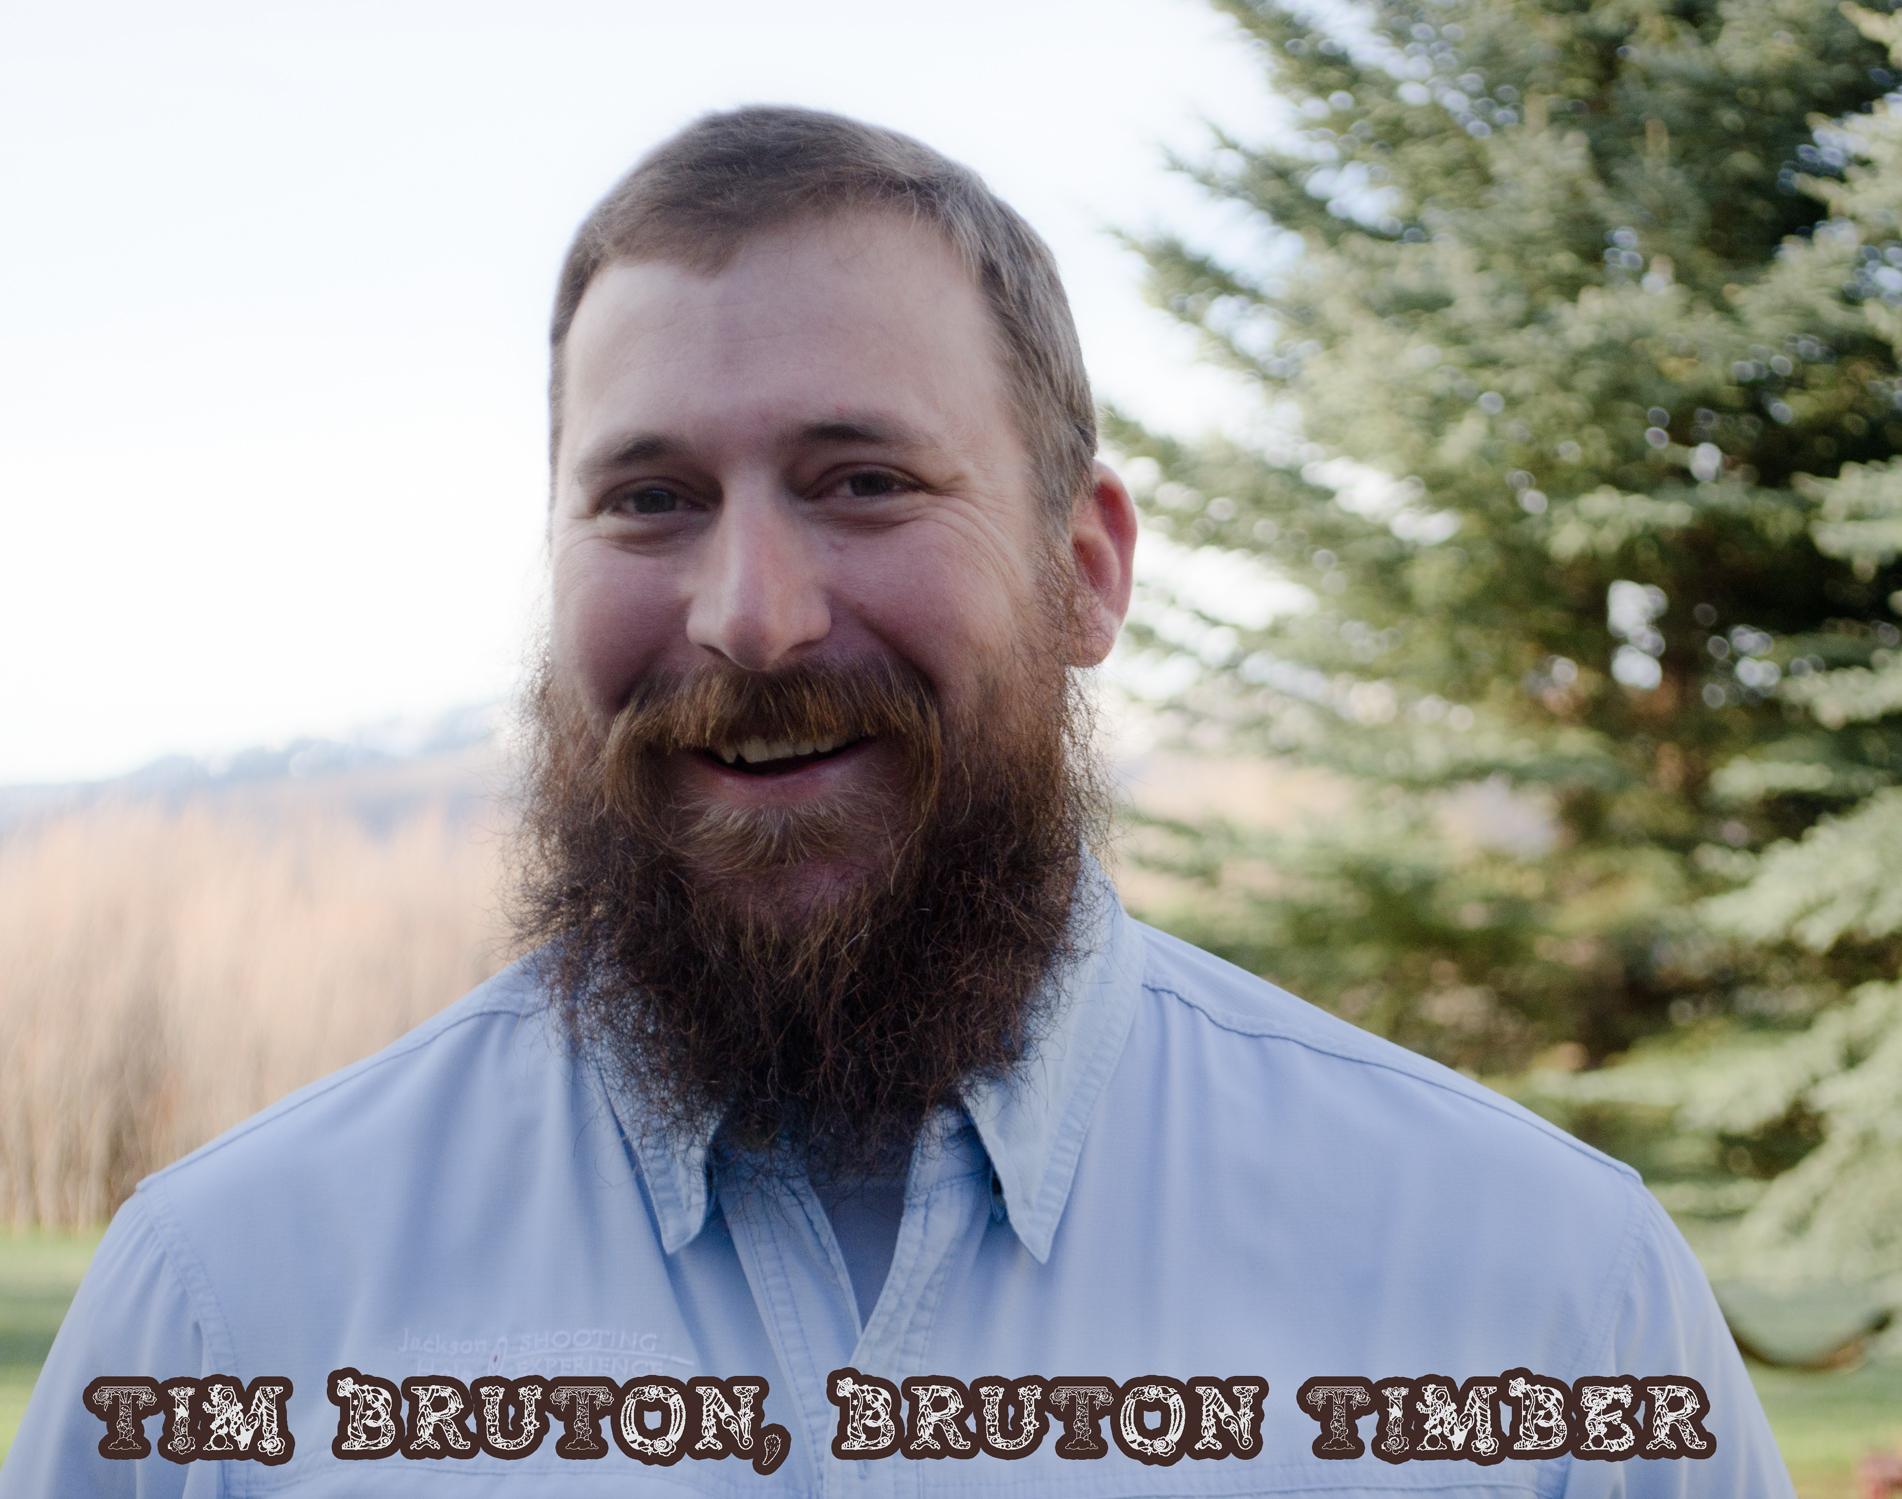 Tim Bruton